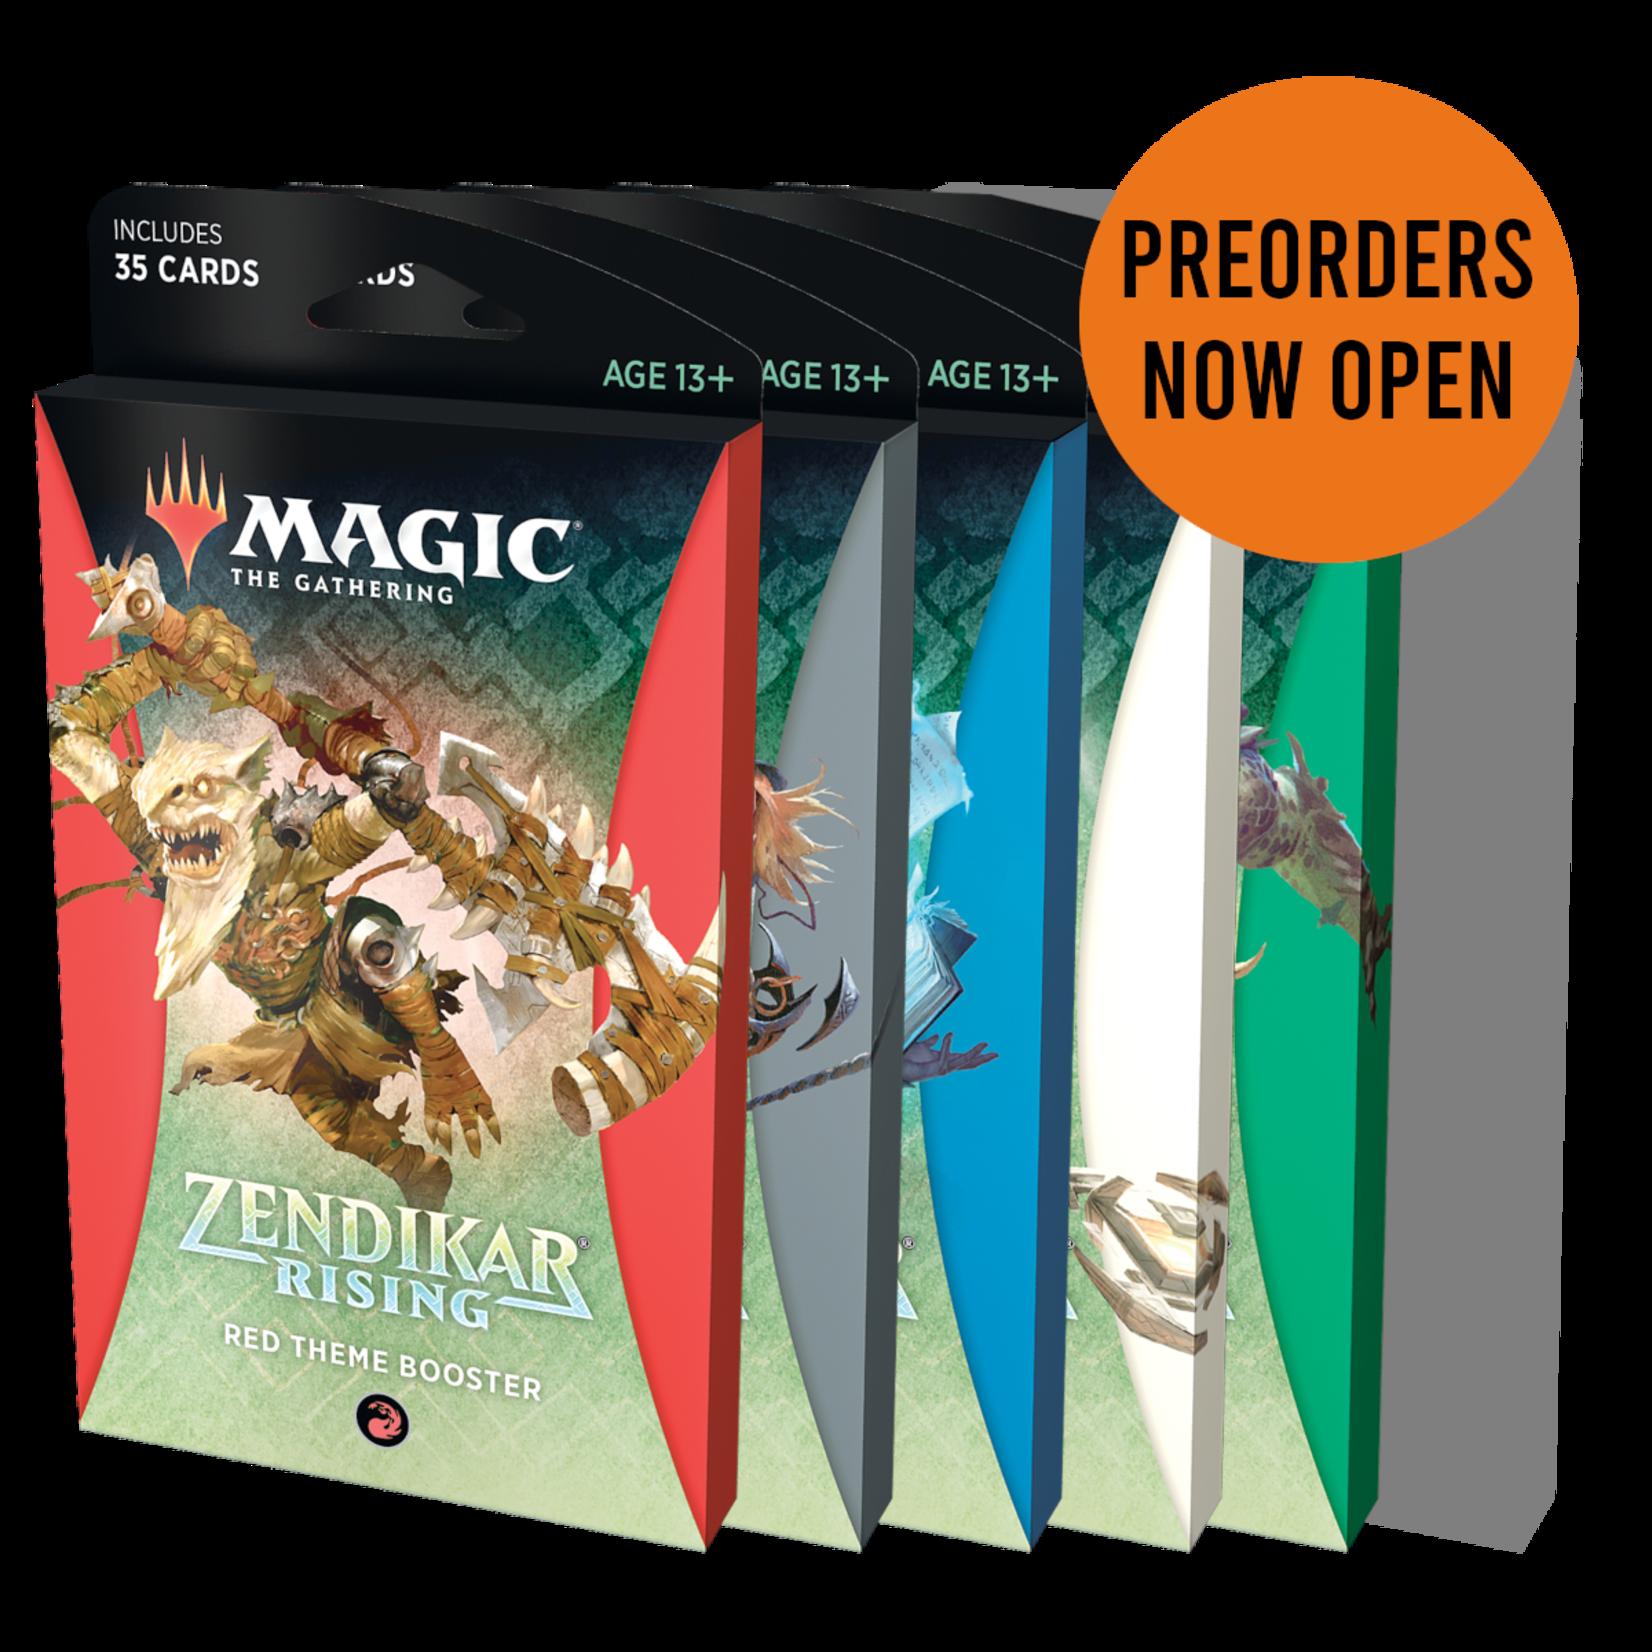 Wizards of the Coast Magic the Gathering: Zendikar Rising - Theme Booster - Set of 6 (Preorder)